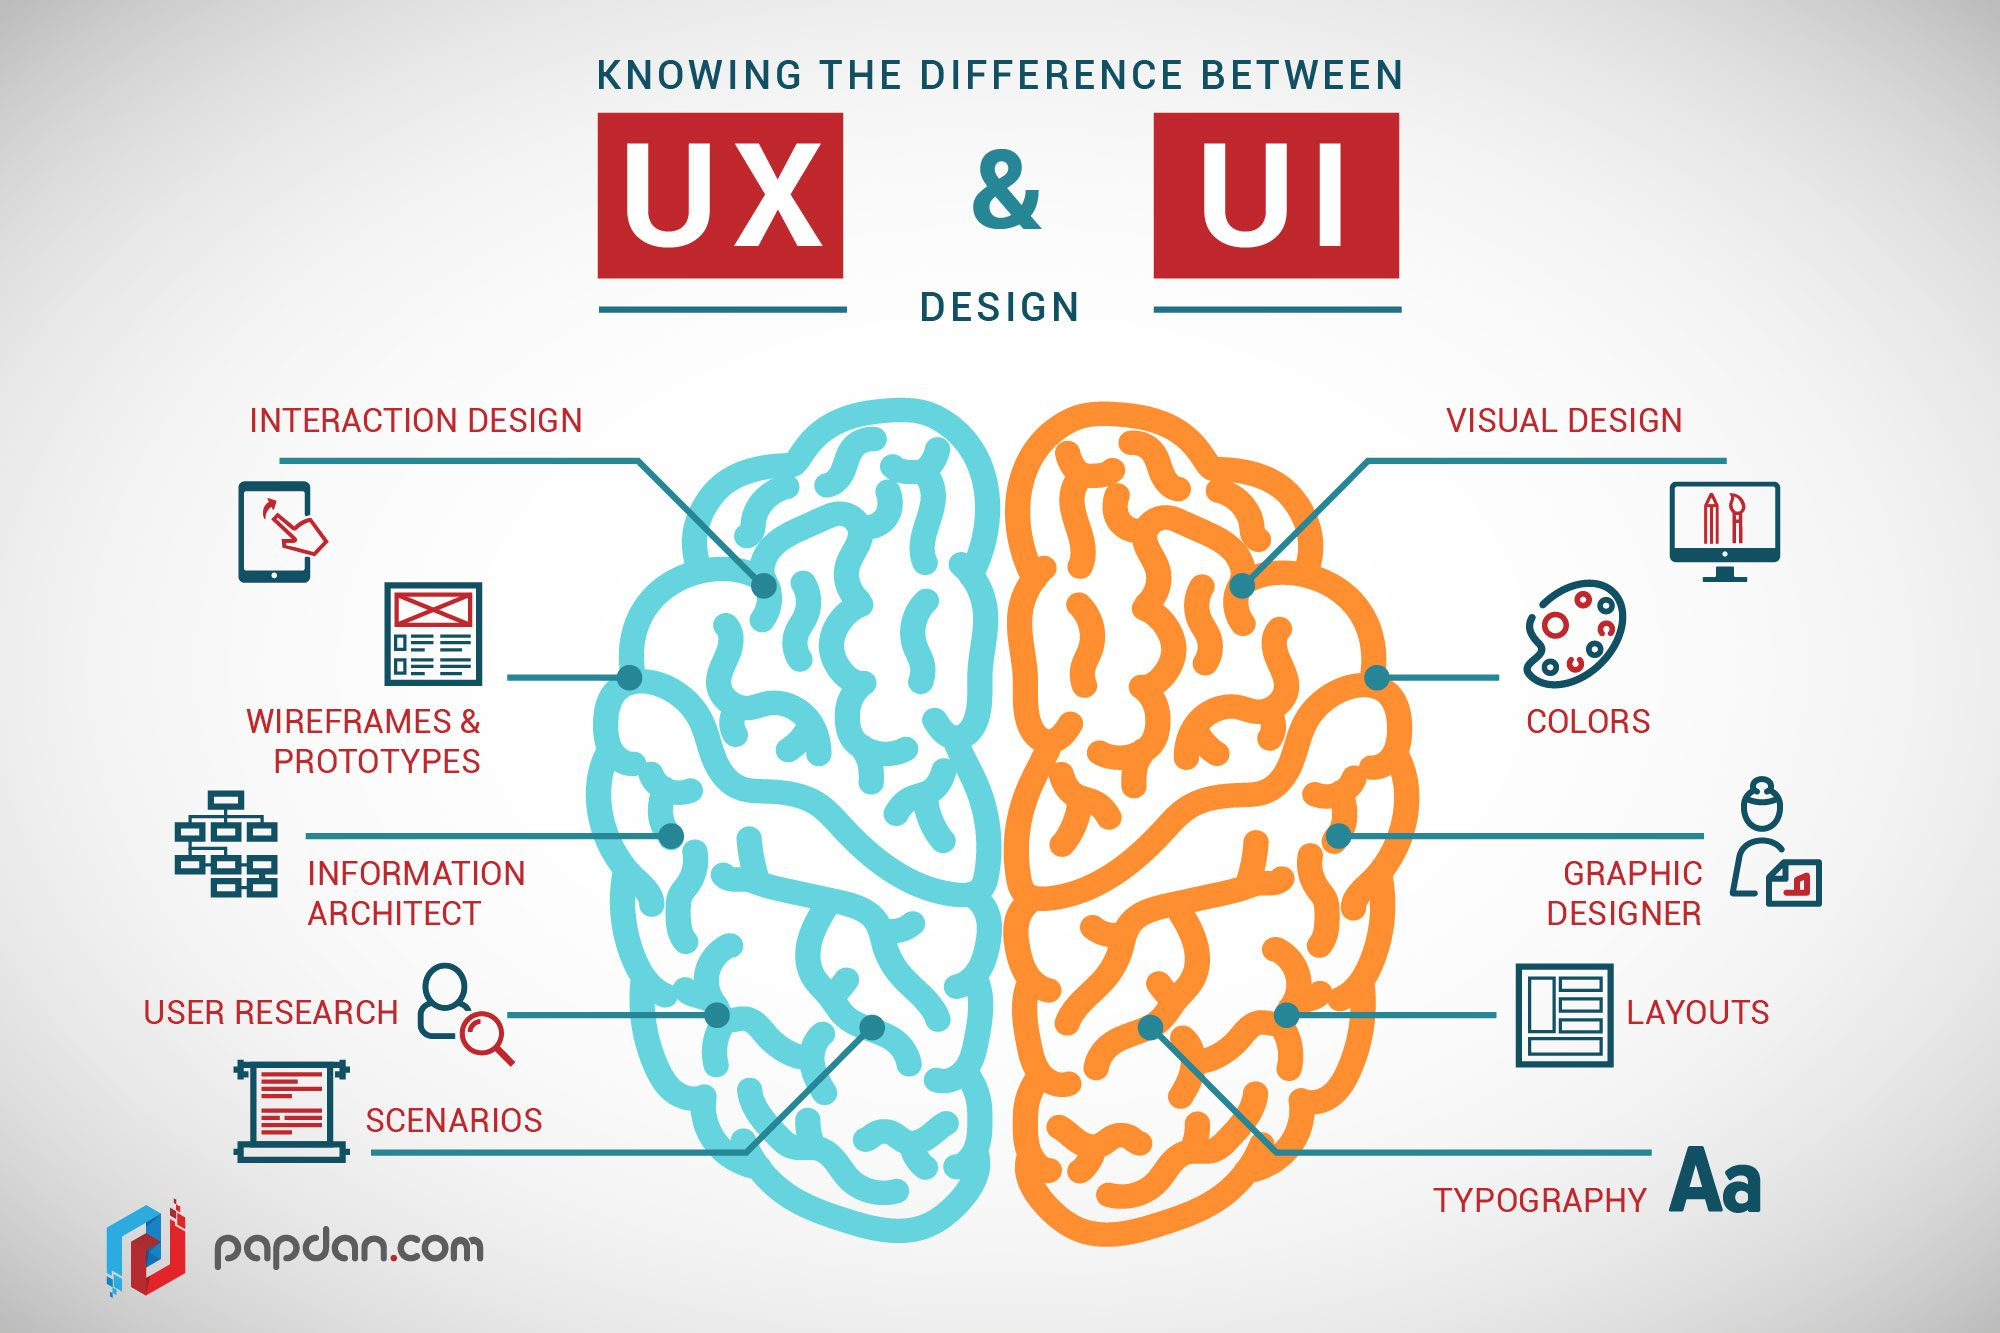 Ui design vs ux design uzu media if you like ux design or ui design vs ux design uzu media if you like ux design or design thinking check out theuxblog ccuart Gallery